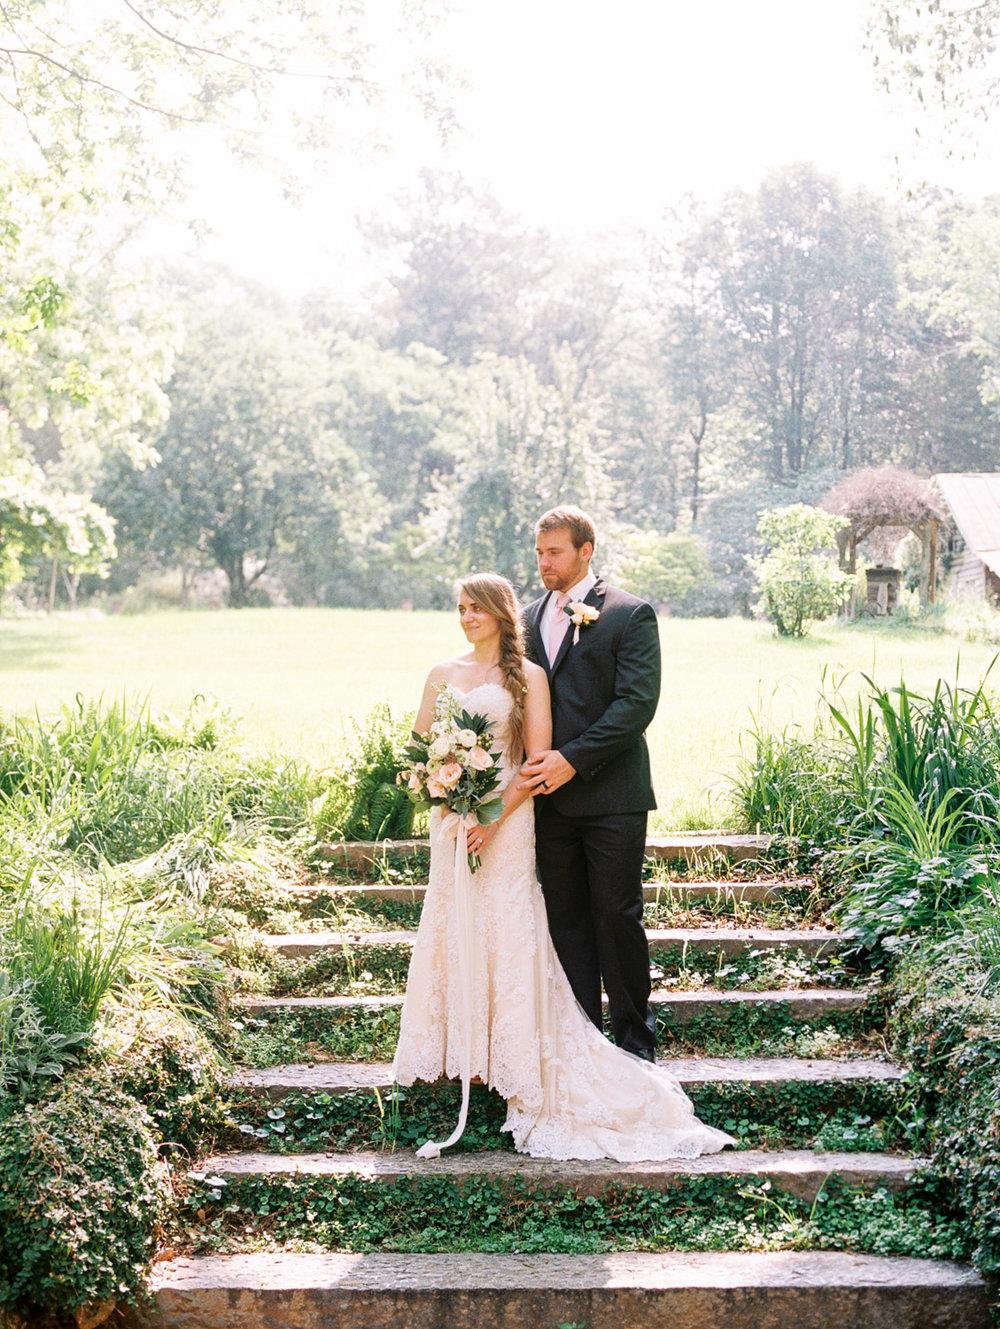 christinadavisphotography-romanticwedding-gardenweddinginspiration08.jpg